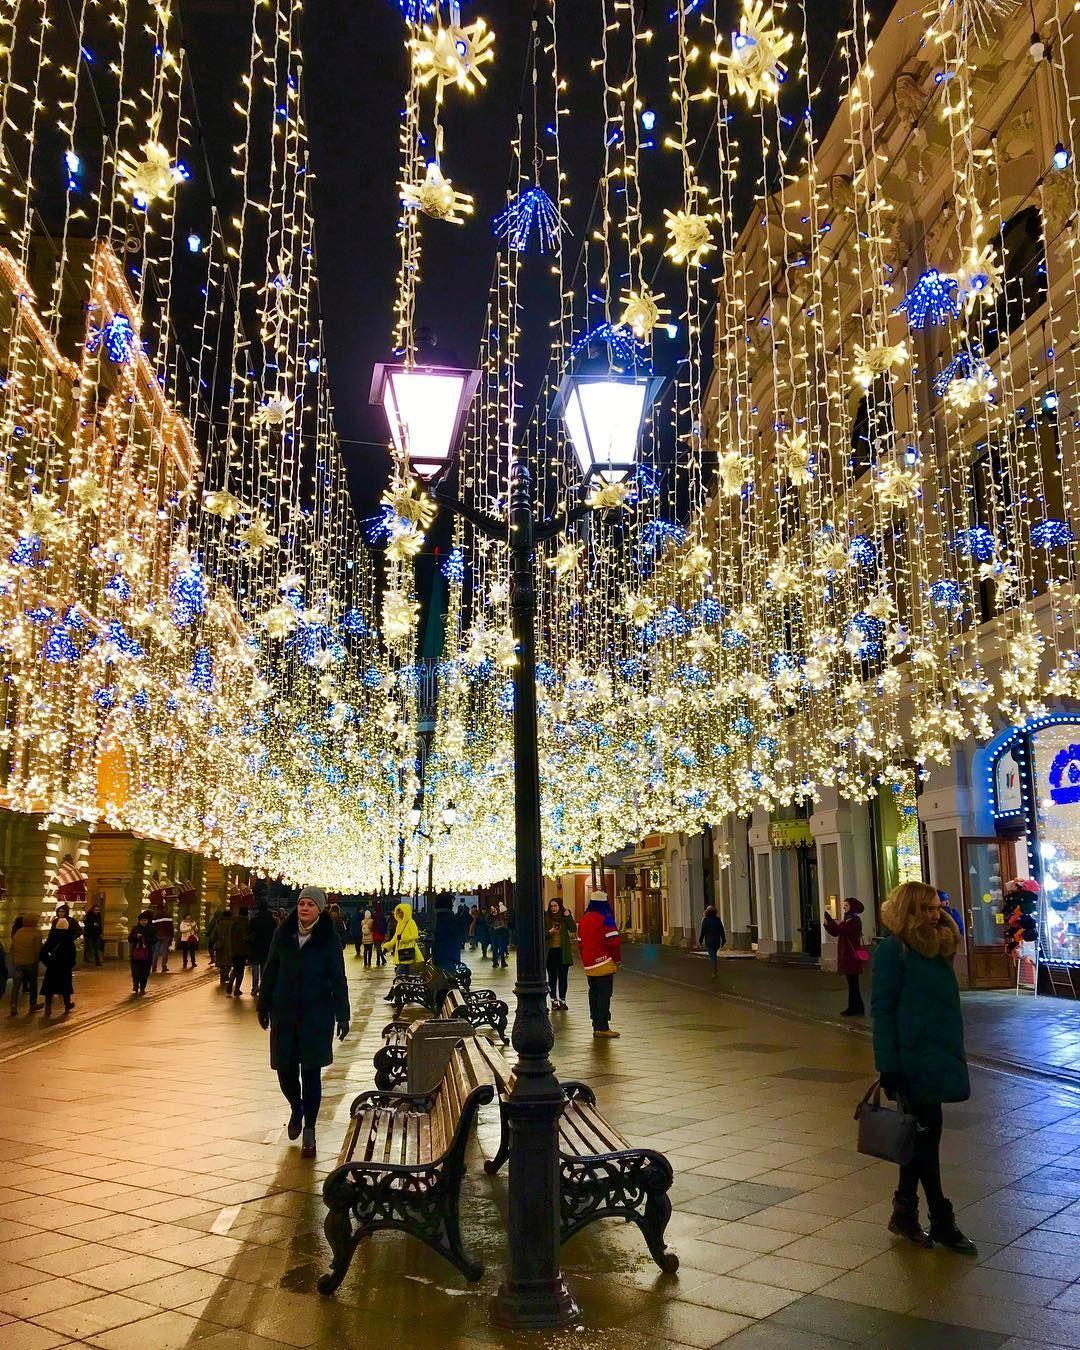 Christmas Lights Near Me 2020 Nanny Jobs Near Me 2020 | Fairy lights decor, Christmas lights